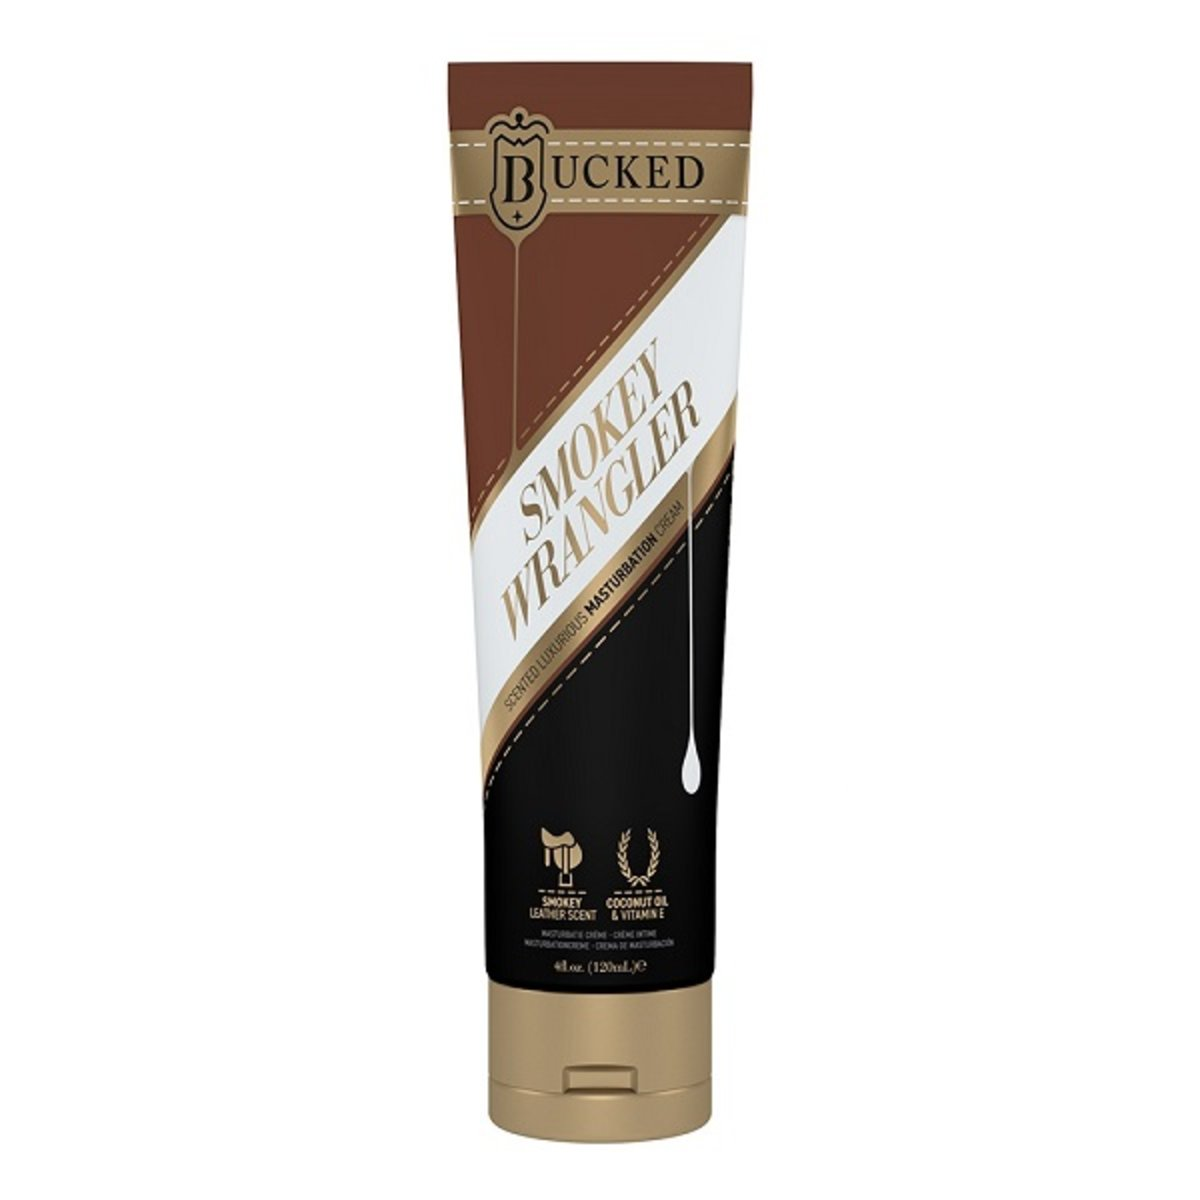 Bucked Smokey Wrangler Masturbation Cream 120ml